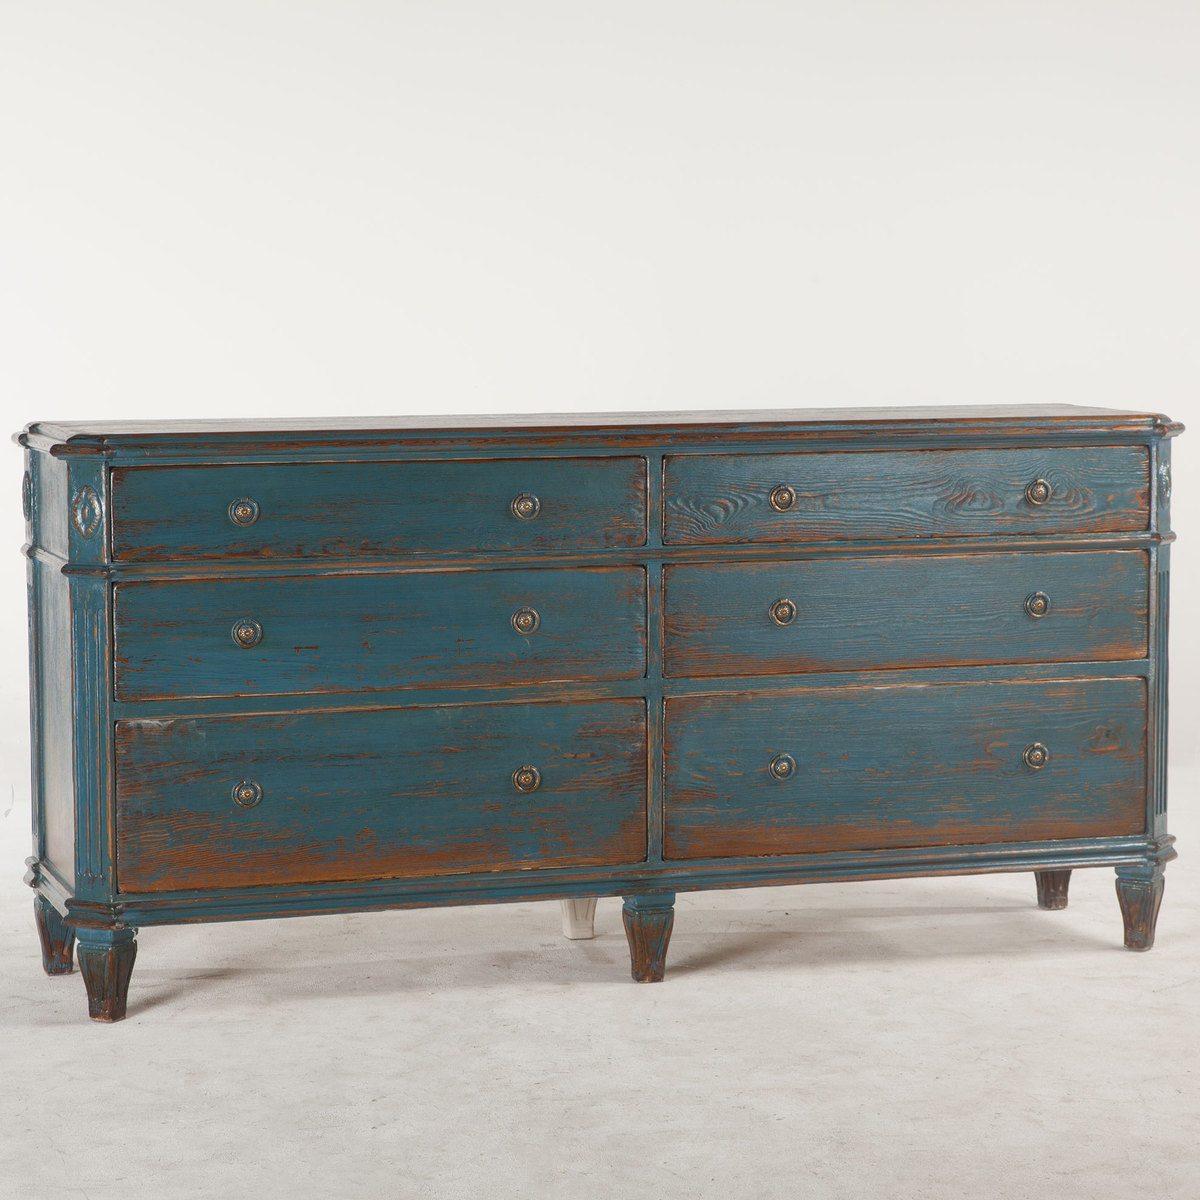 lirbary-dresser-2